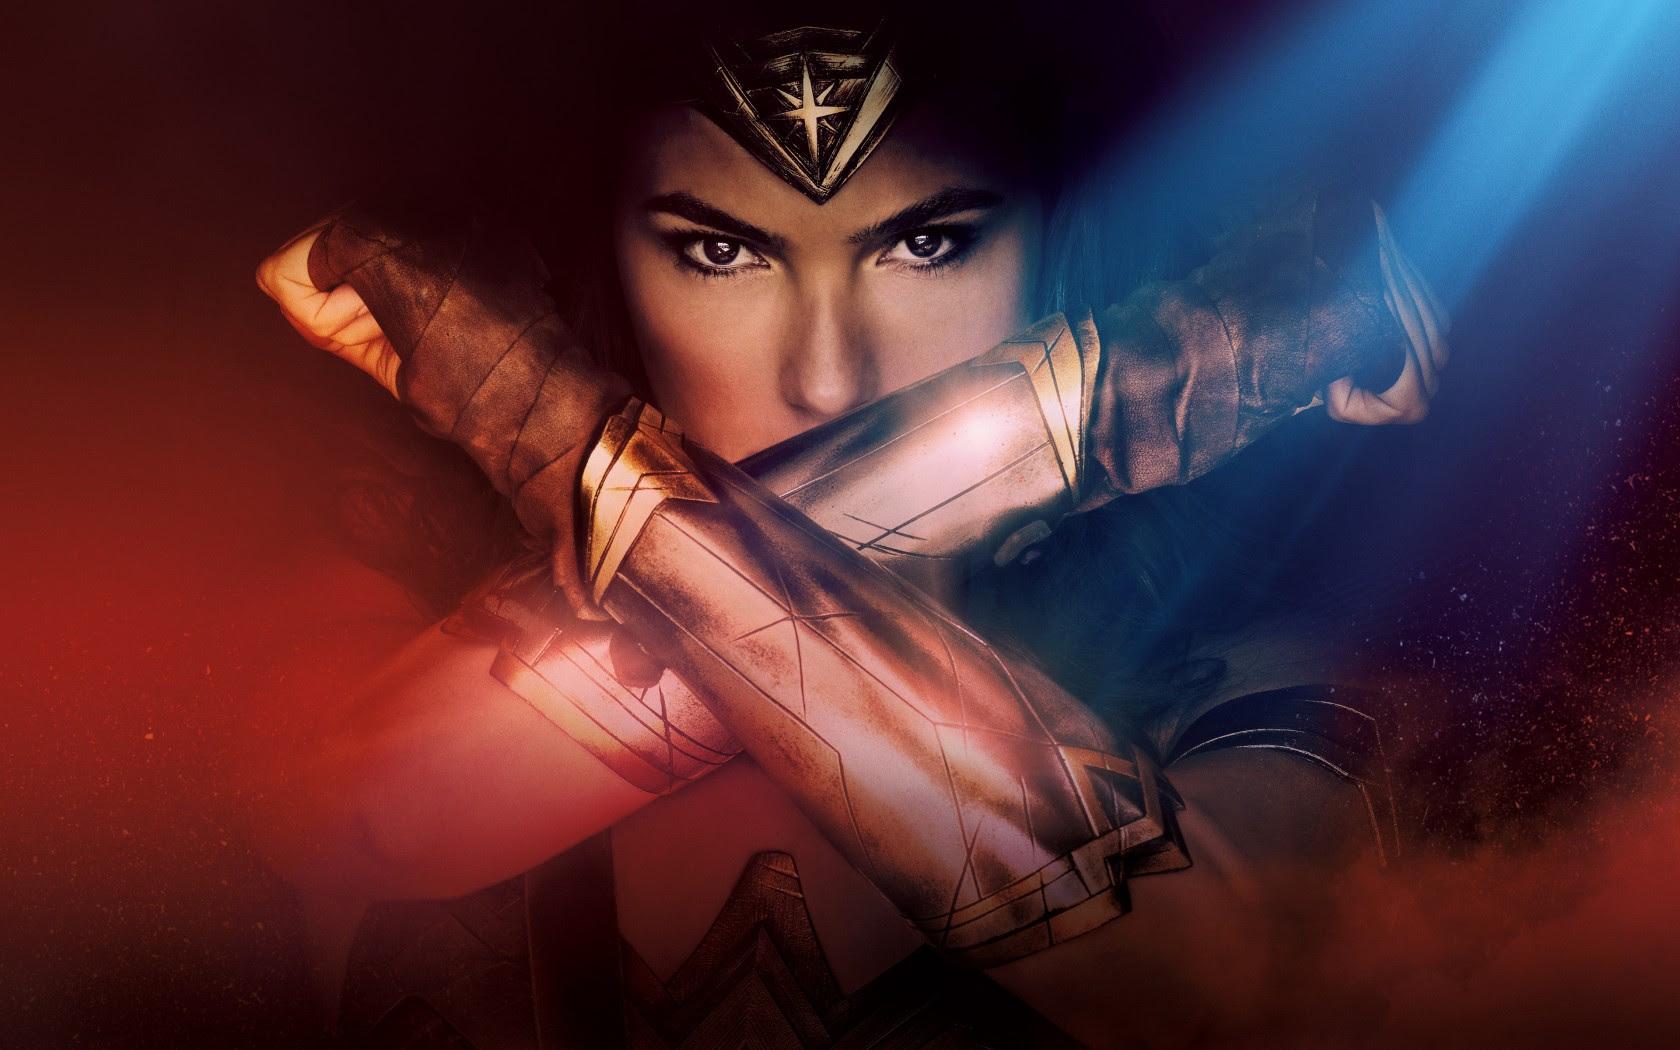 2017 Wonder Woman Movie Wallpapers  HD Wallpapers  ID 19000